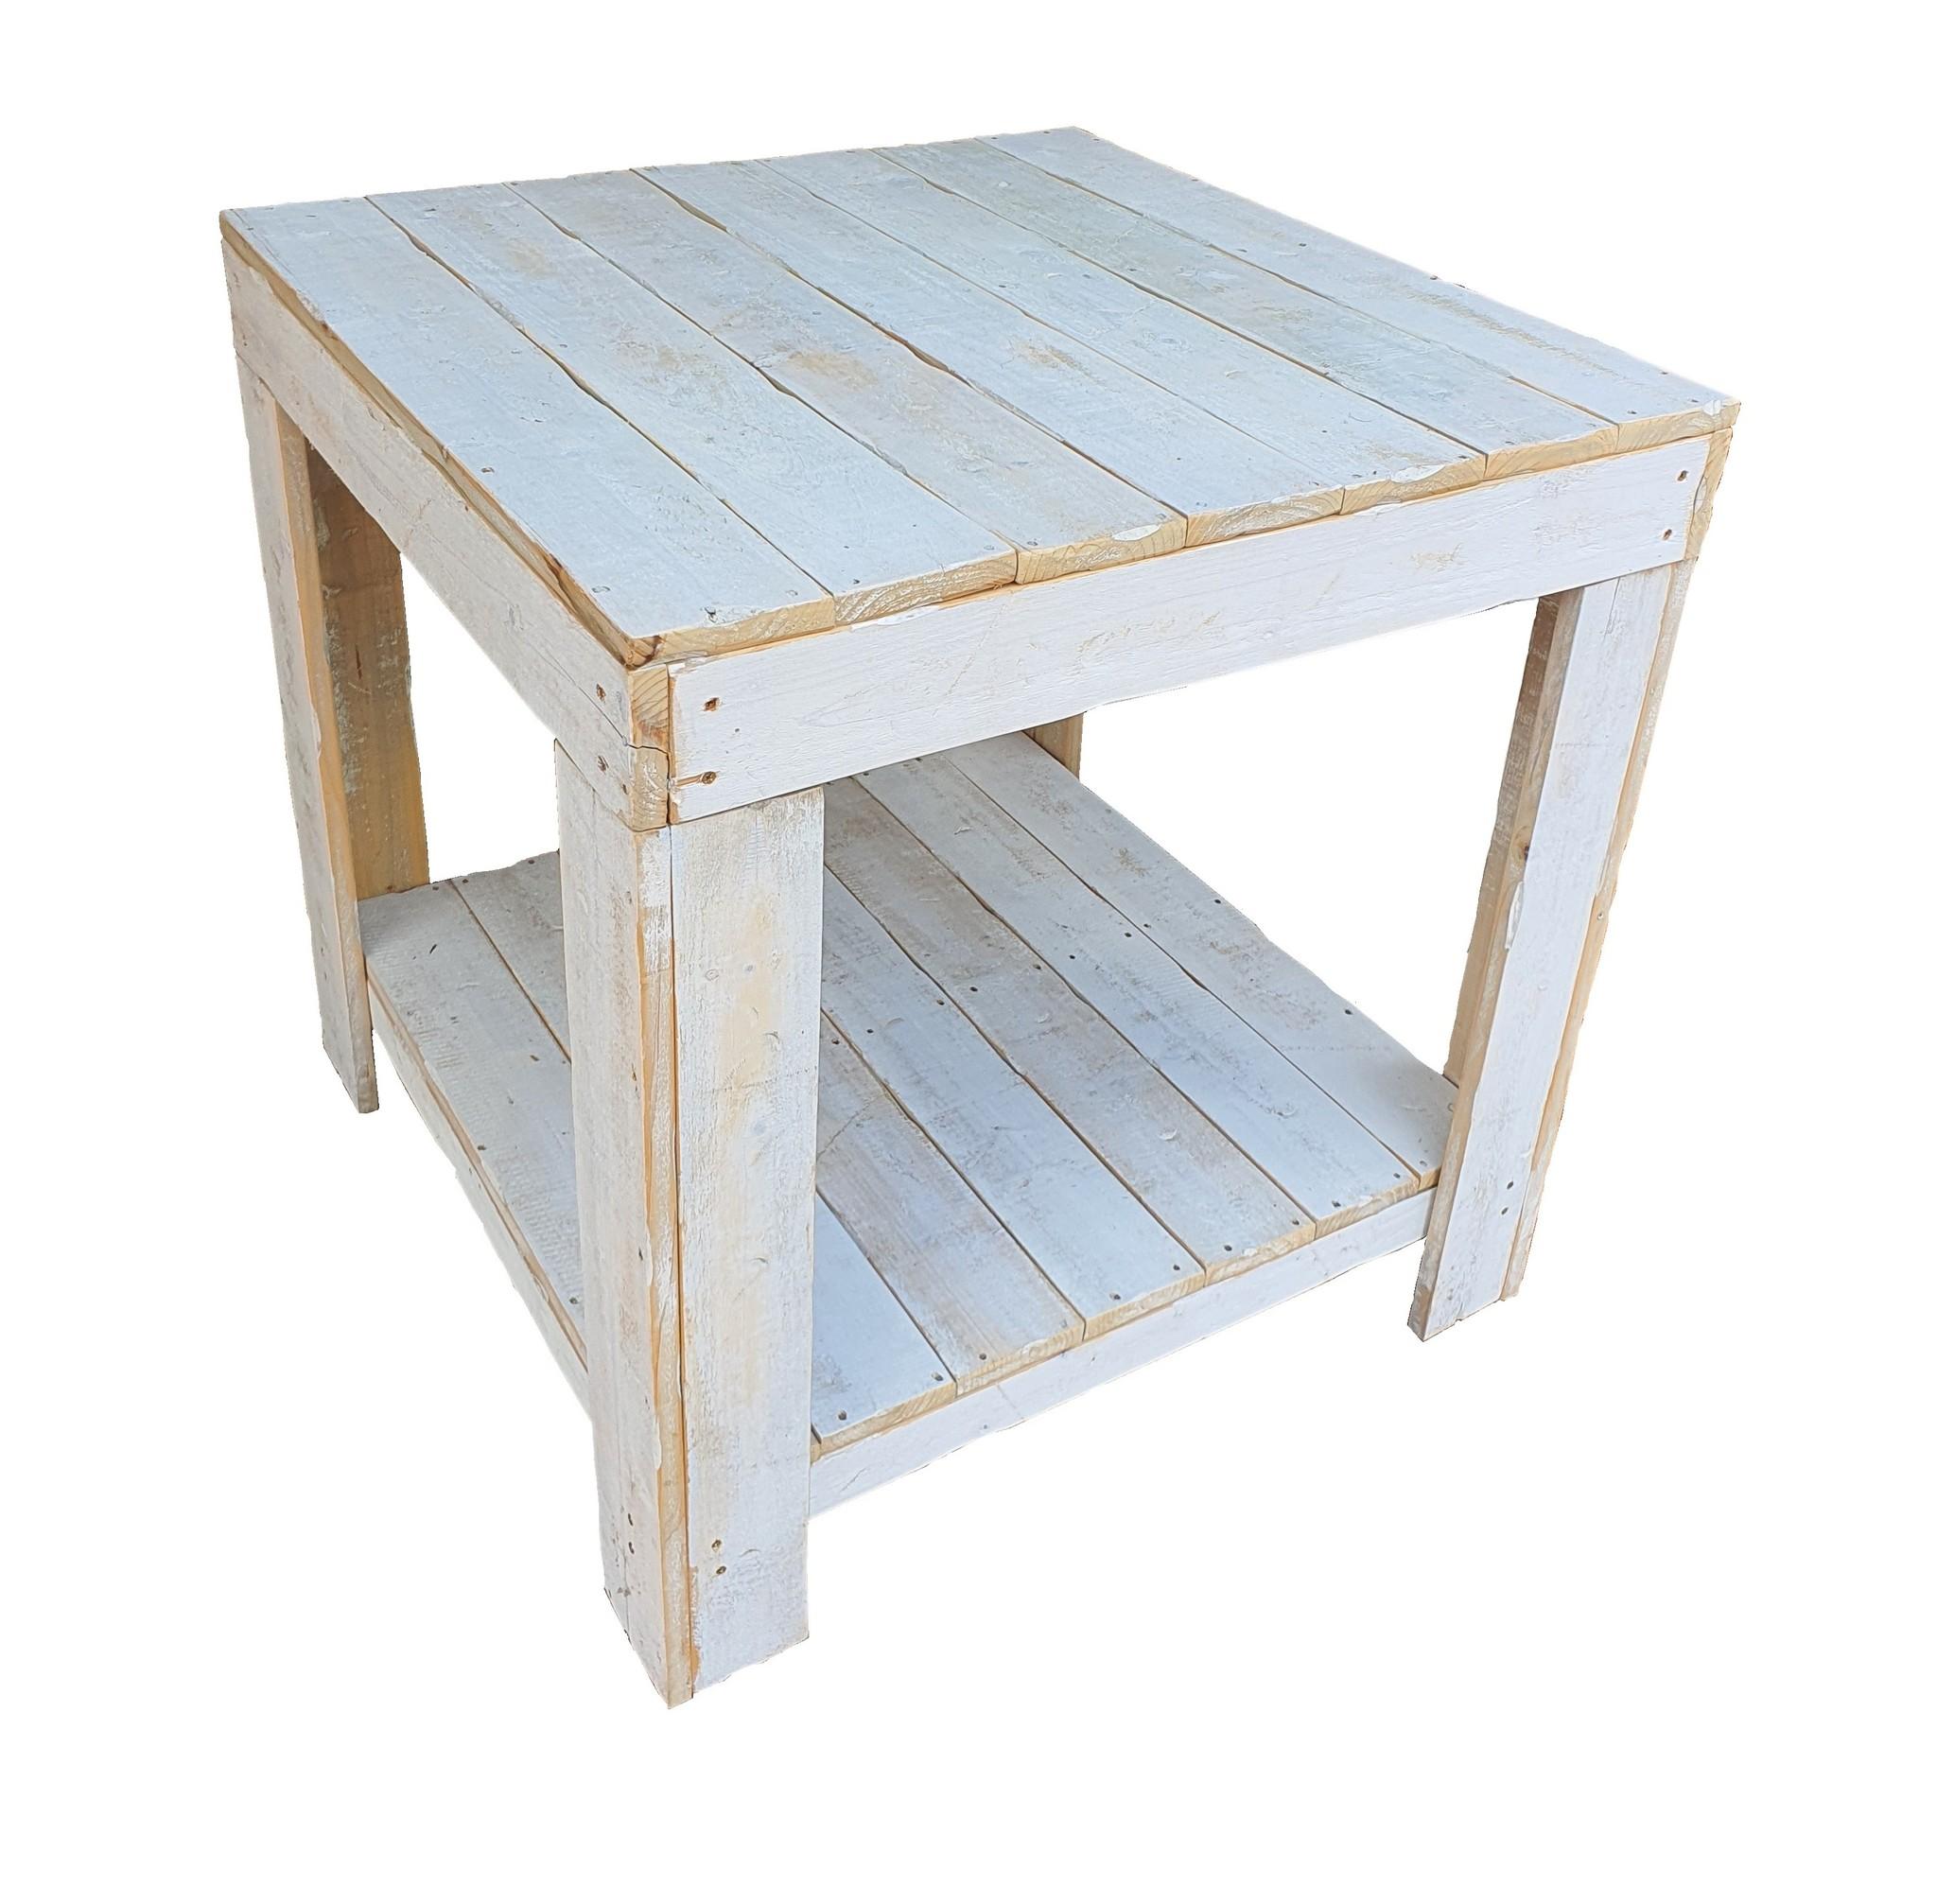 shop int ibiza white table double 78-1